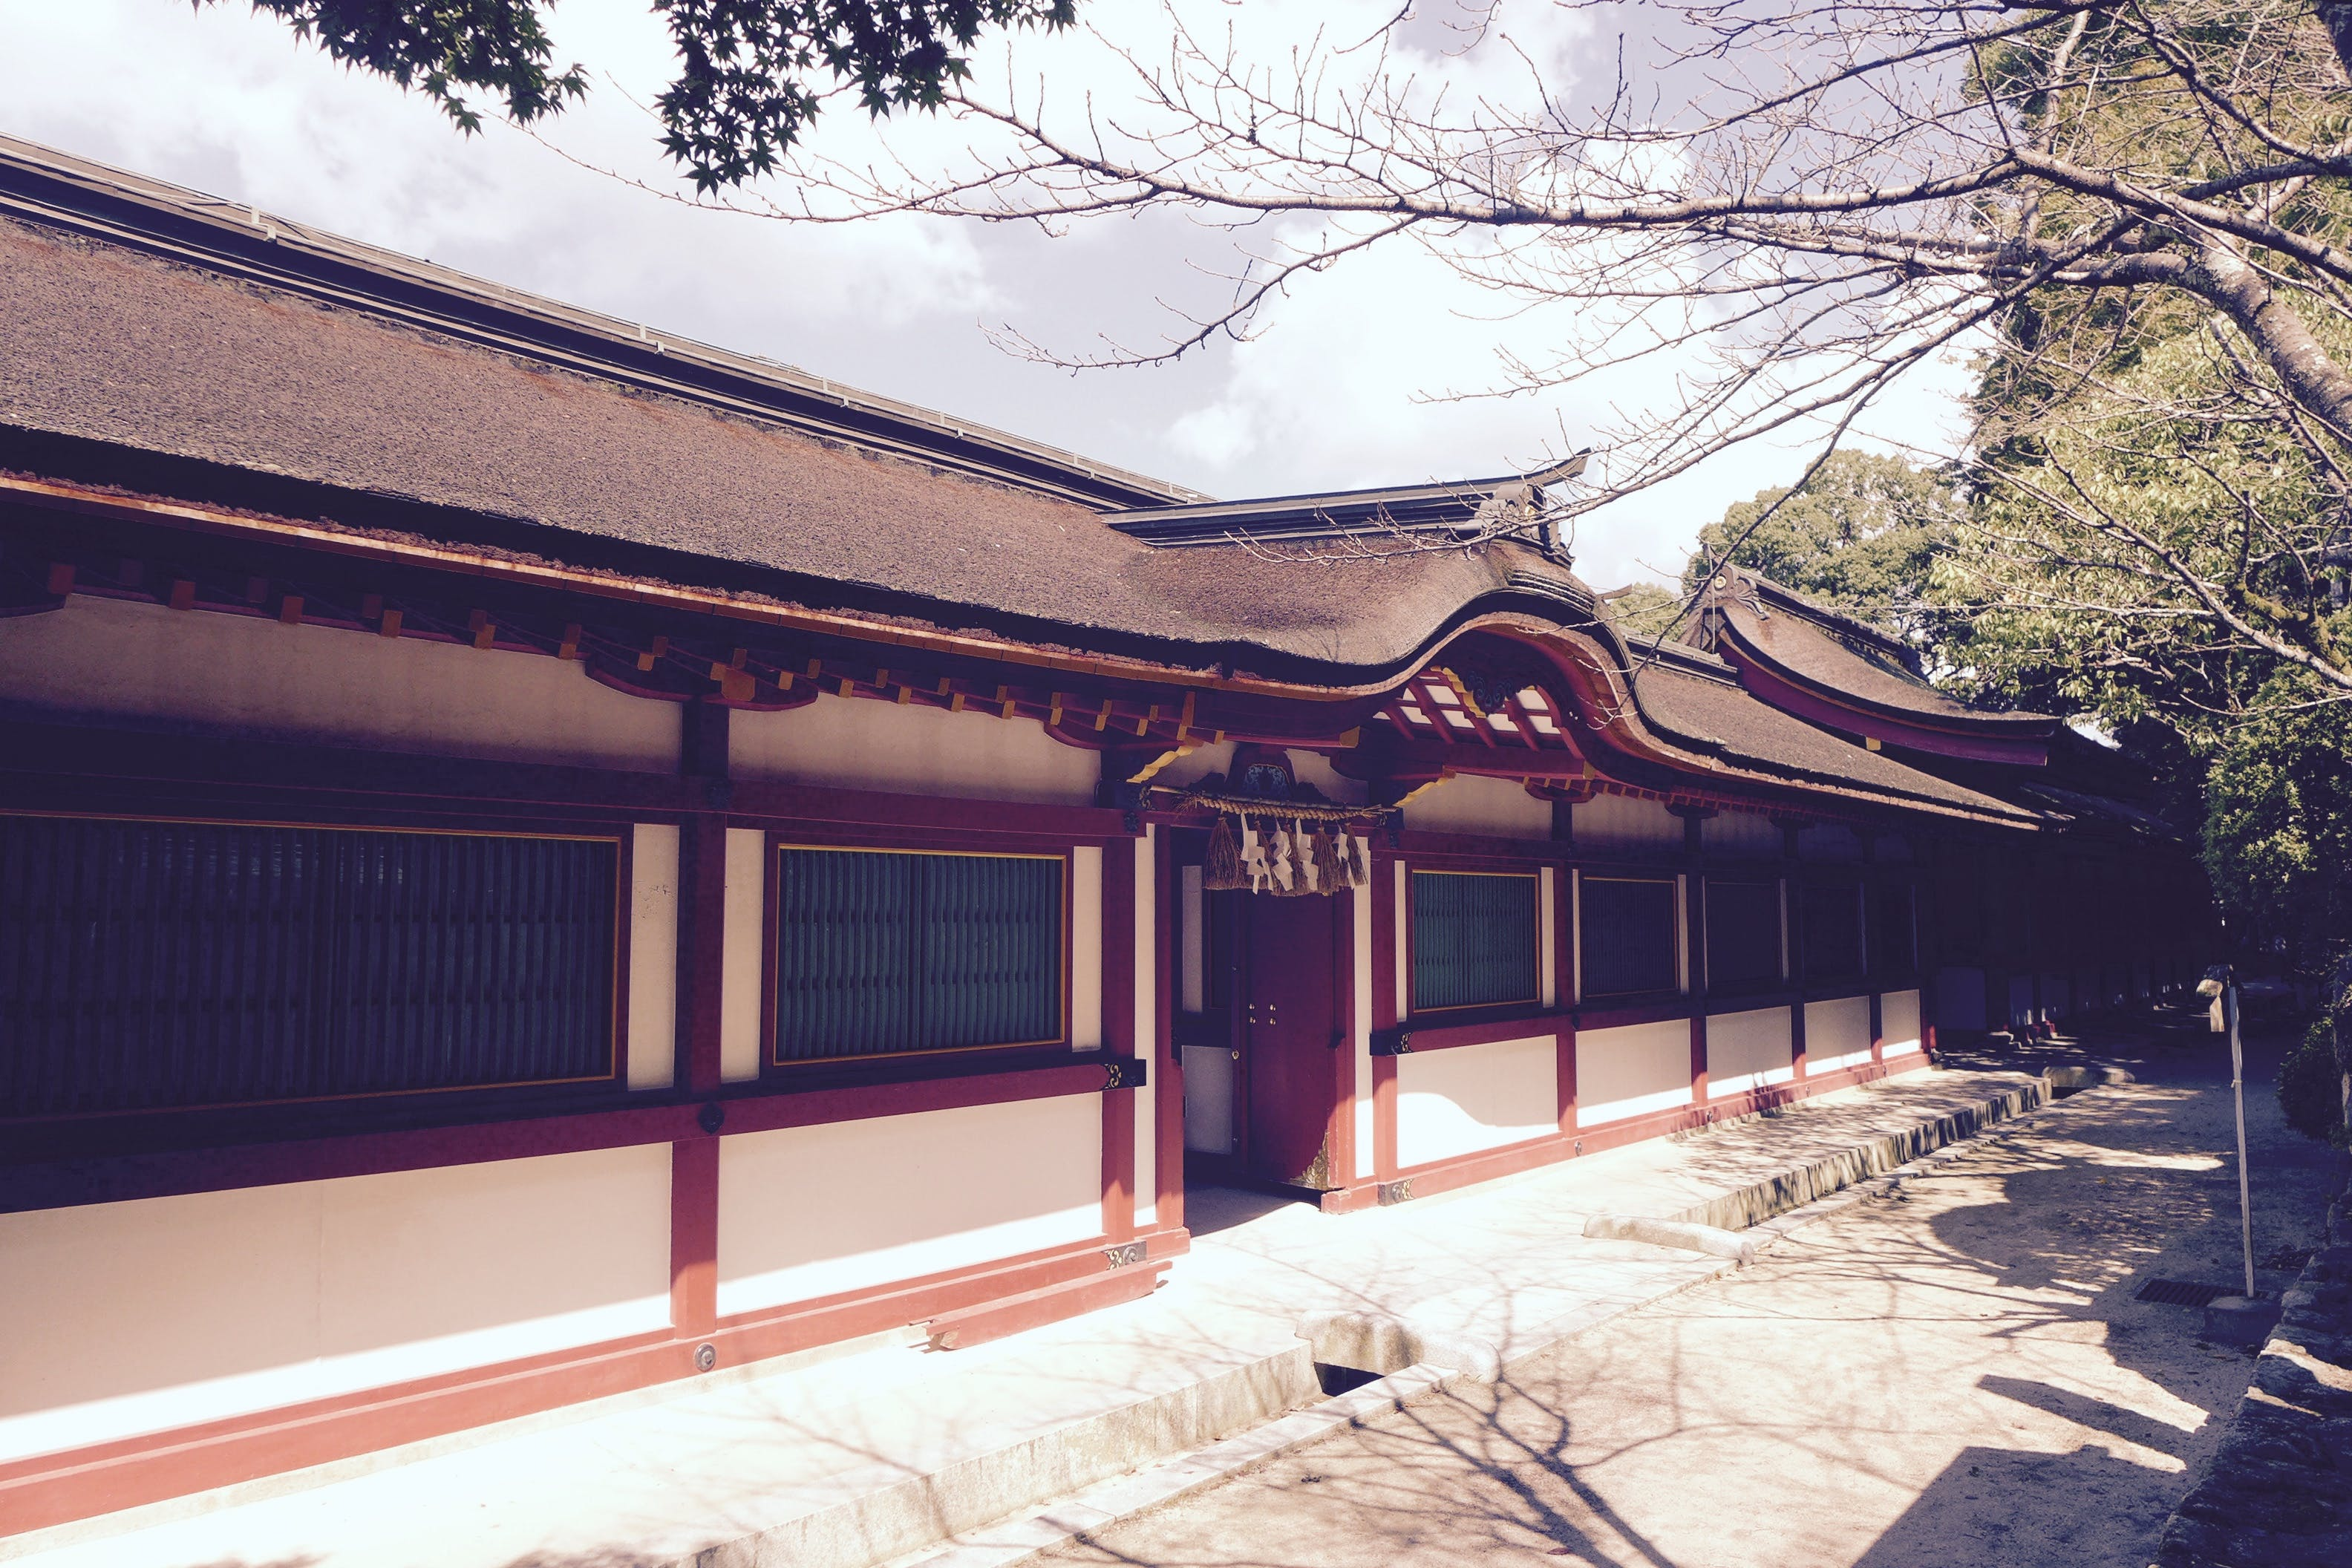 Free stock photo of buddhist temple